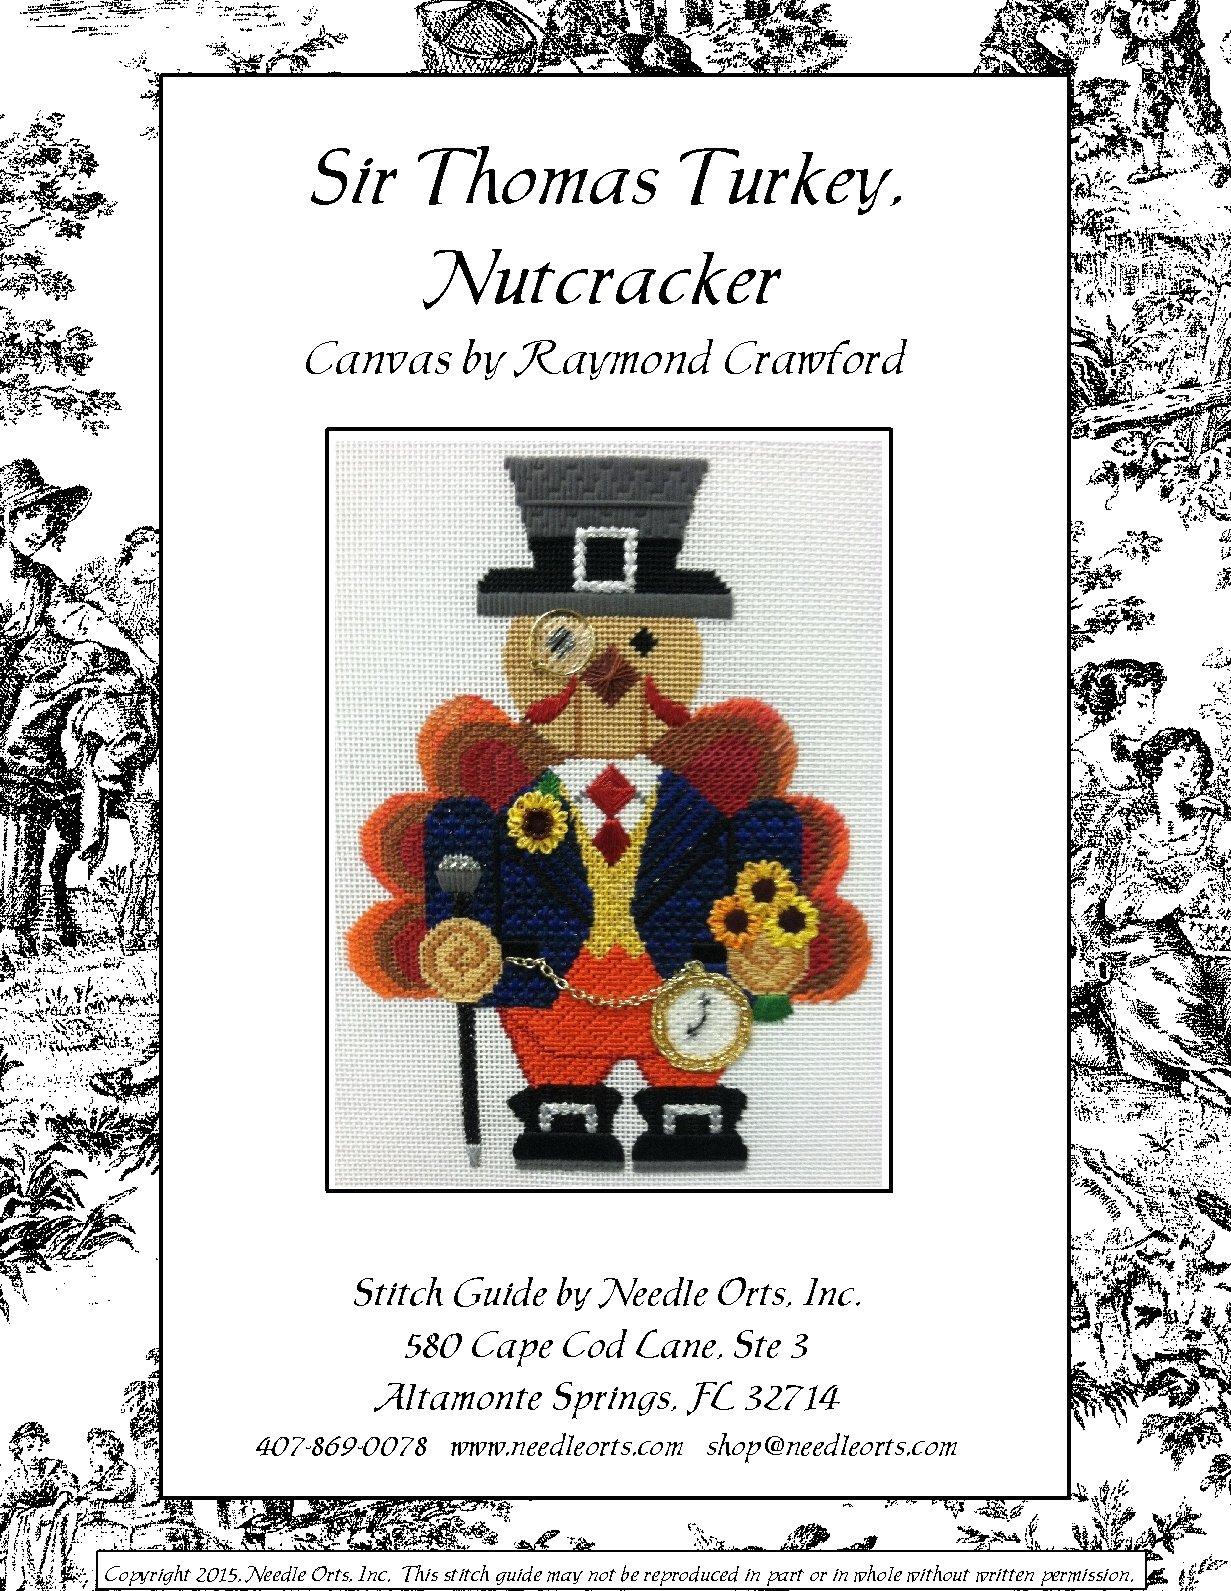 Sir Thomas Turkey Nutcracker